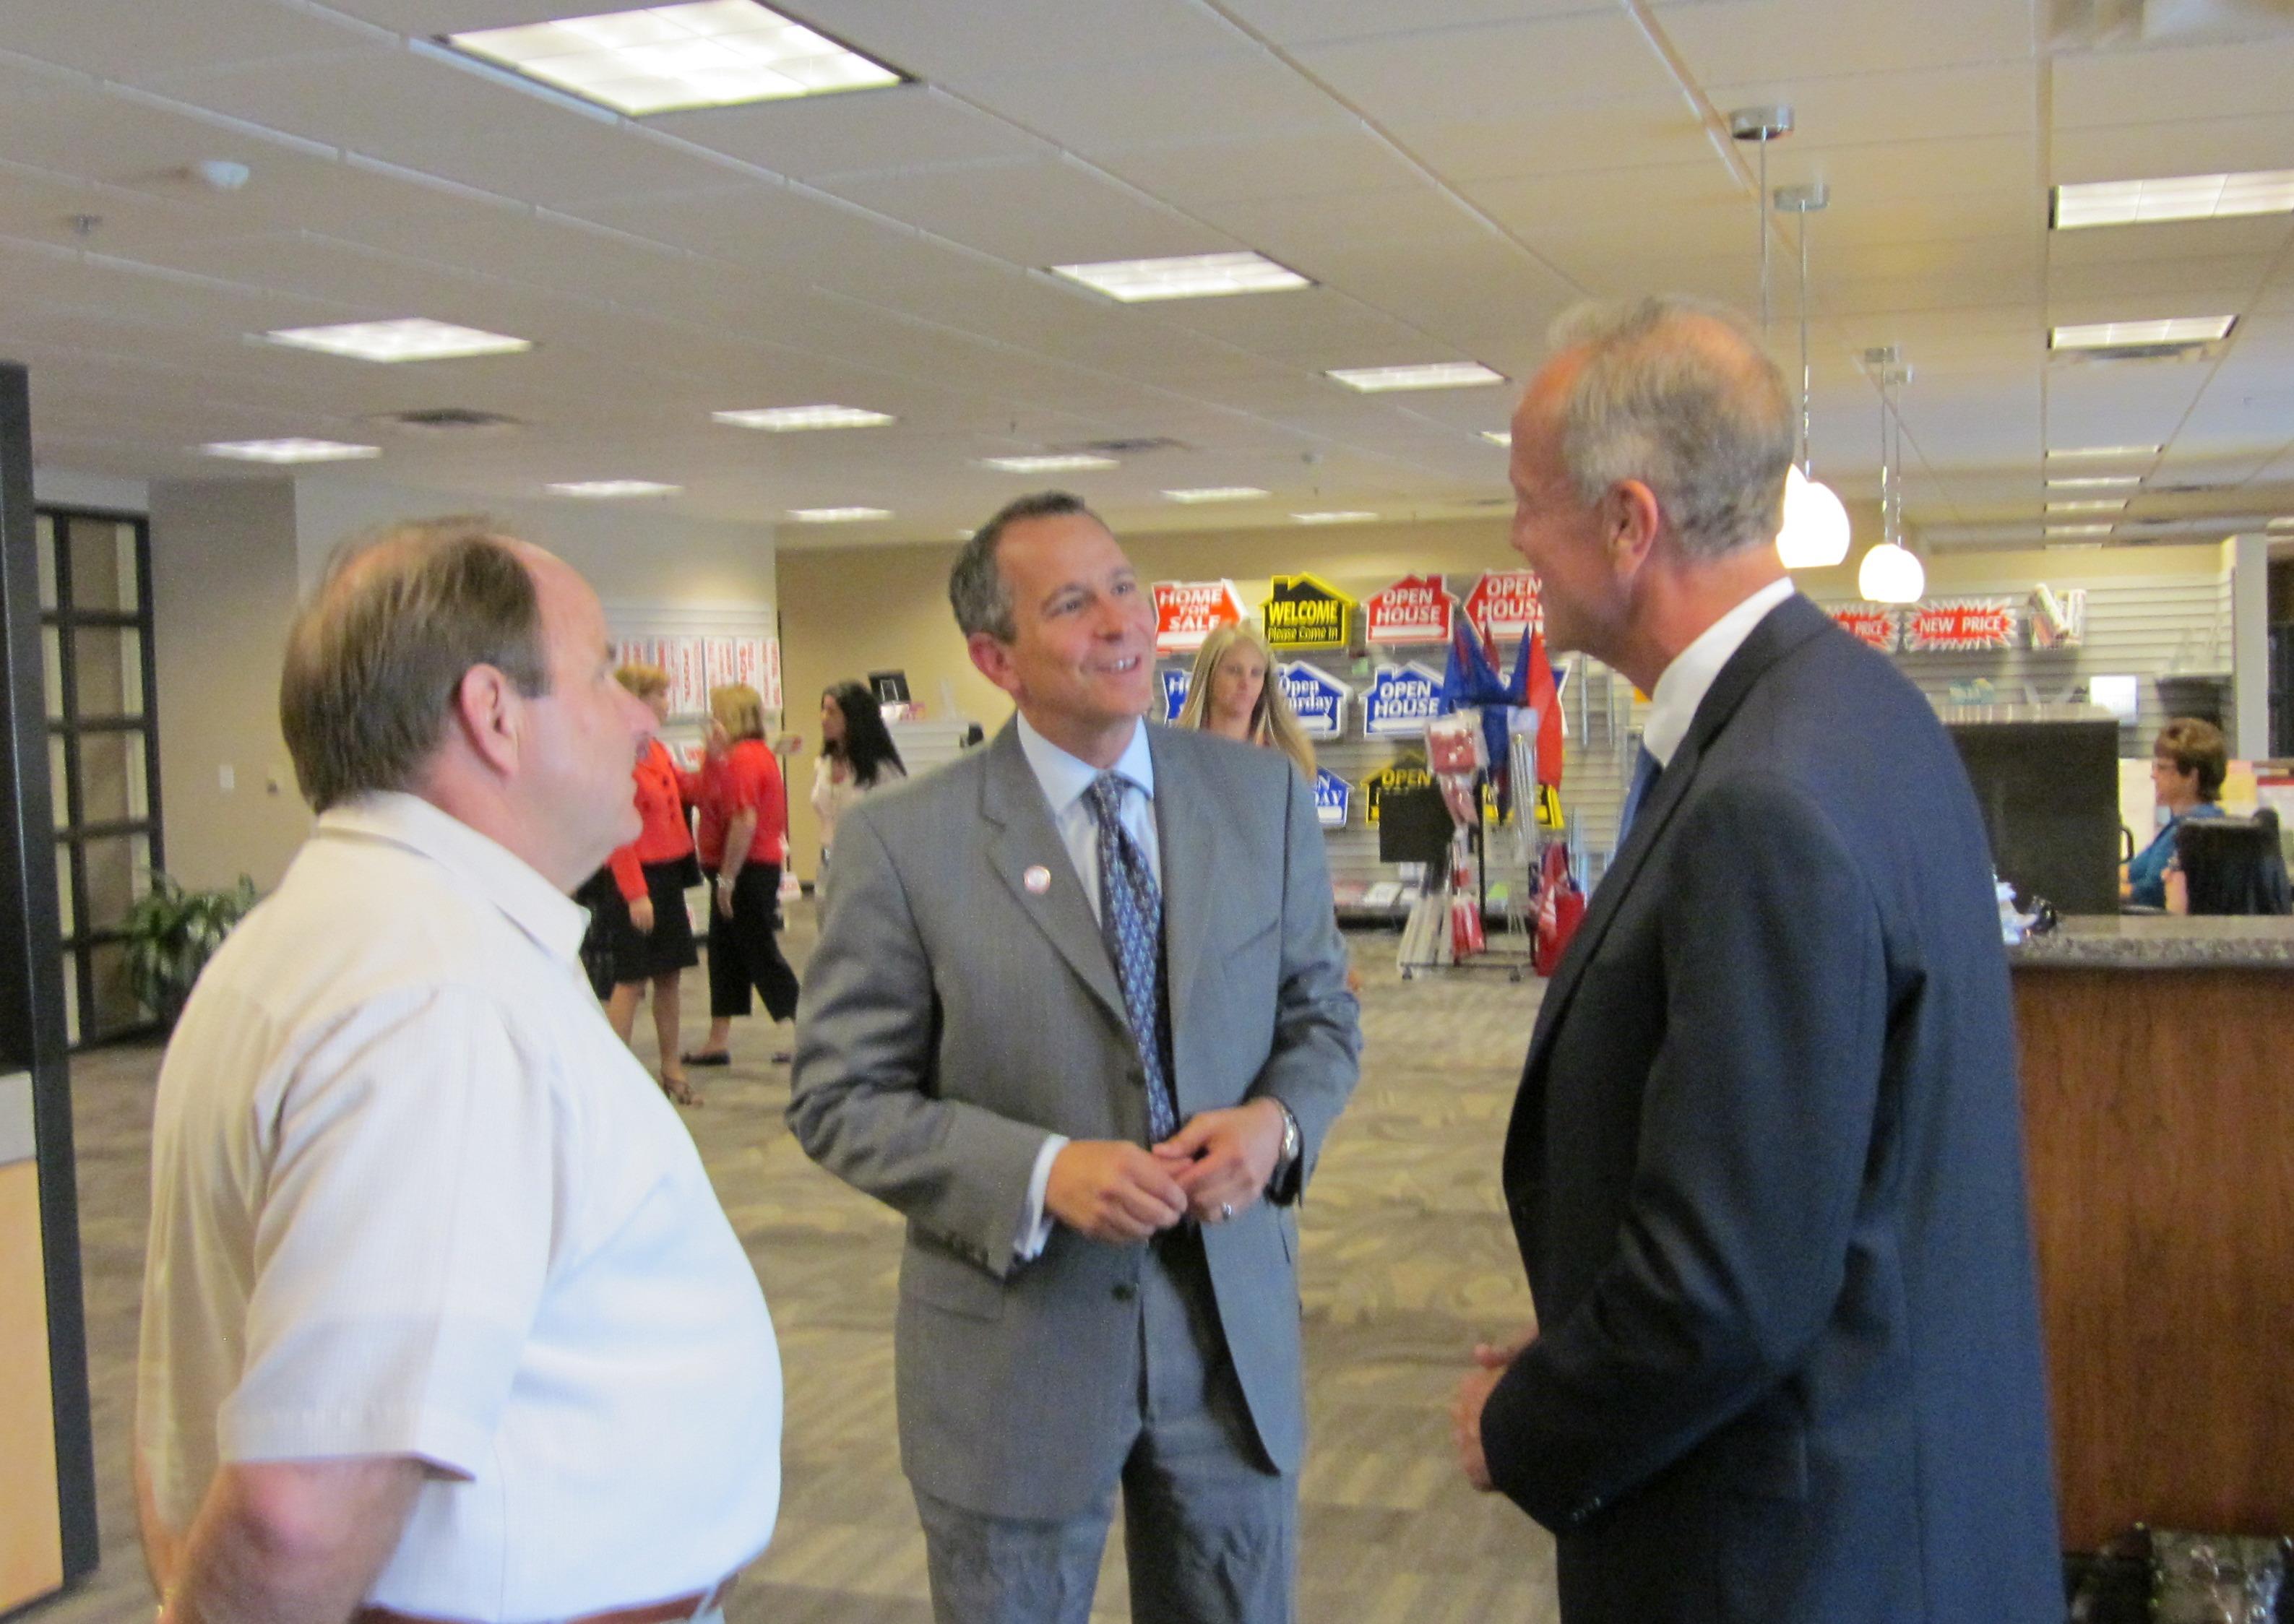 Sen. Moran Meets with Kansas Realtors